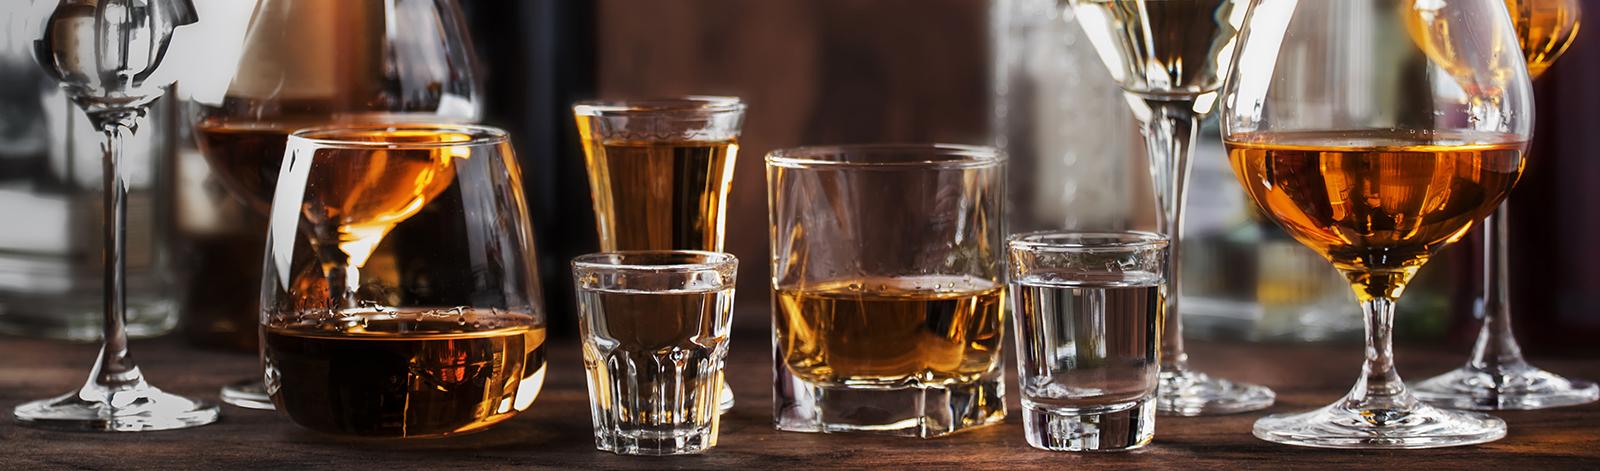 Assortment of liquors in glasses